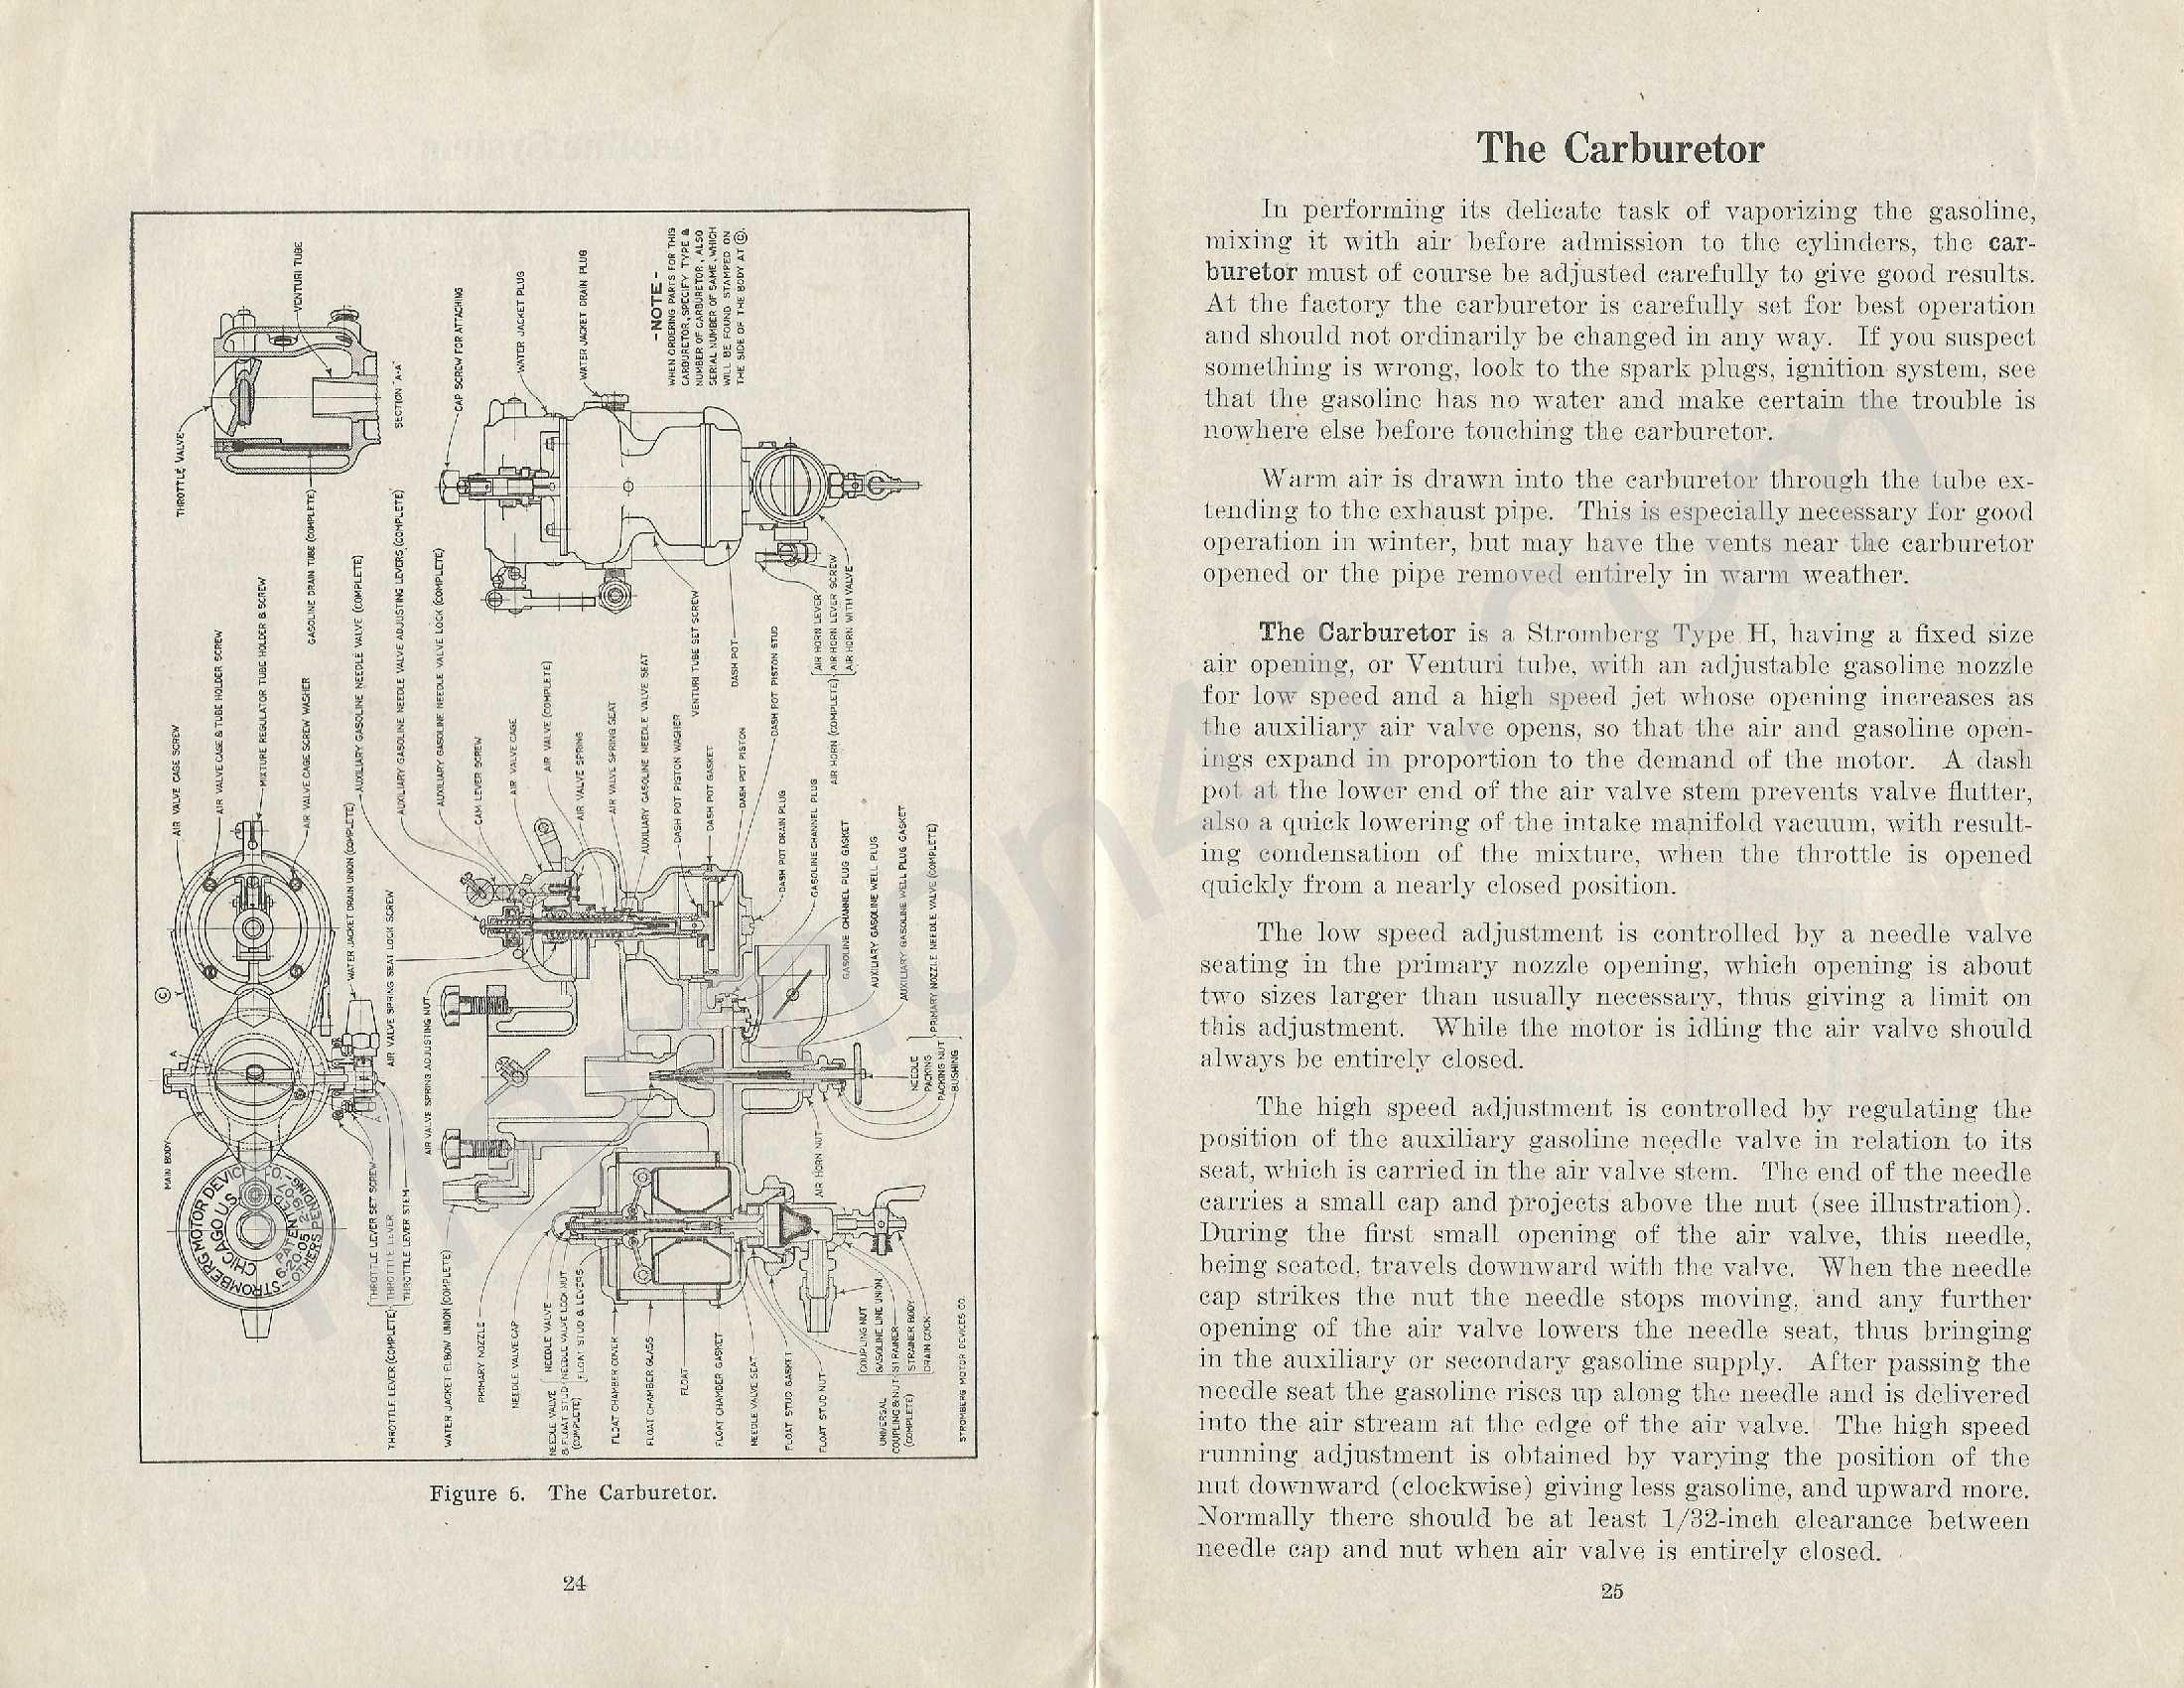 1915-07-01_Marmon41_Info_Book_1534-B_14